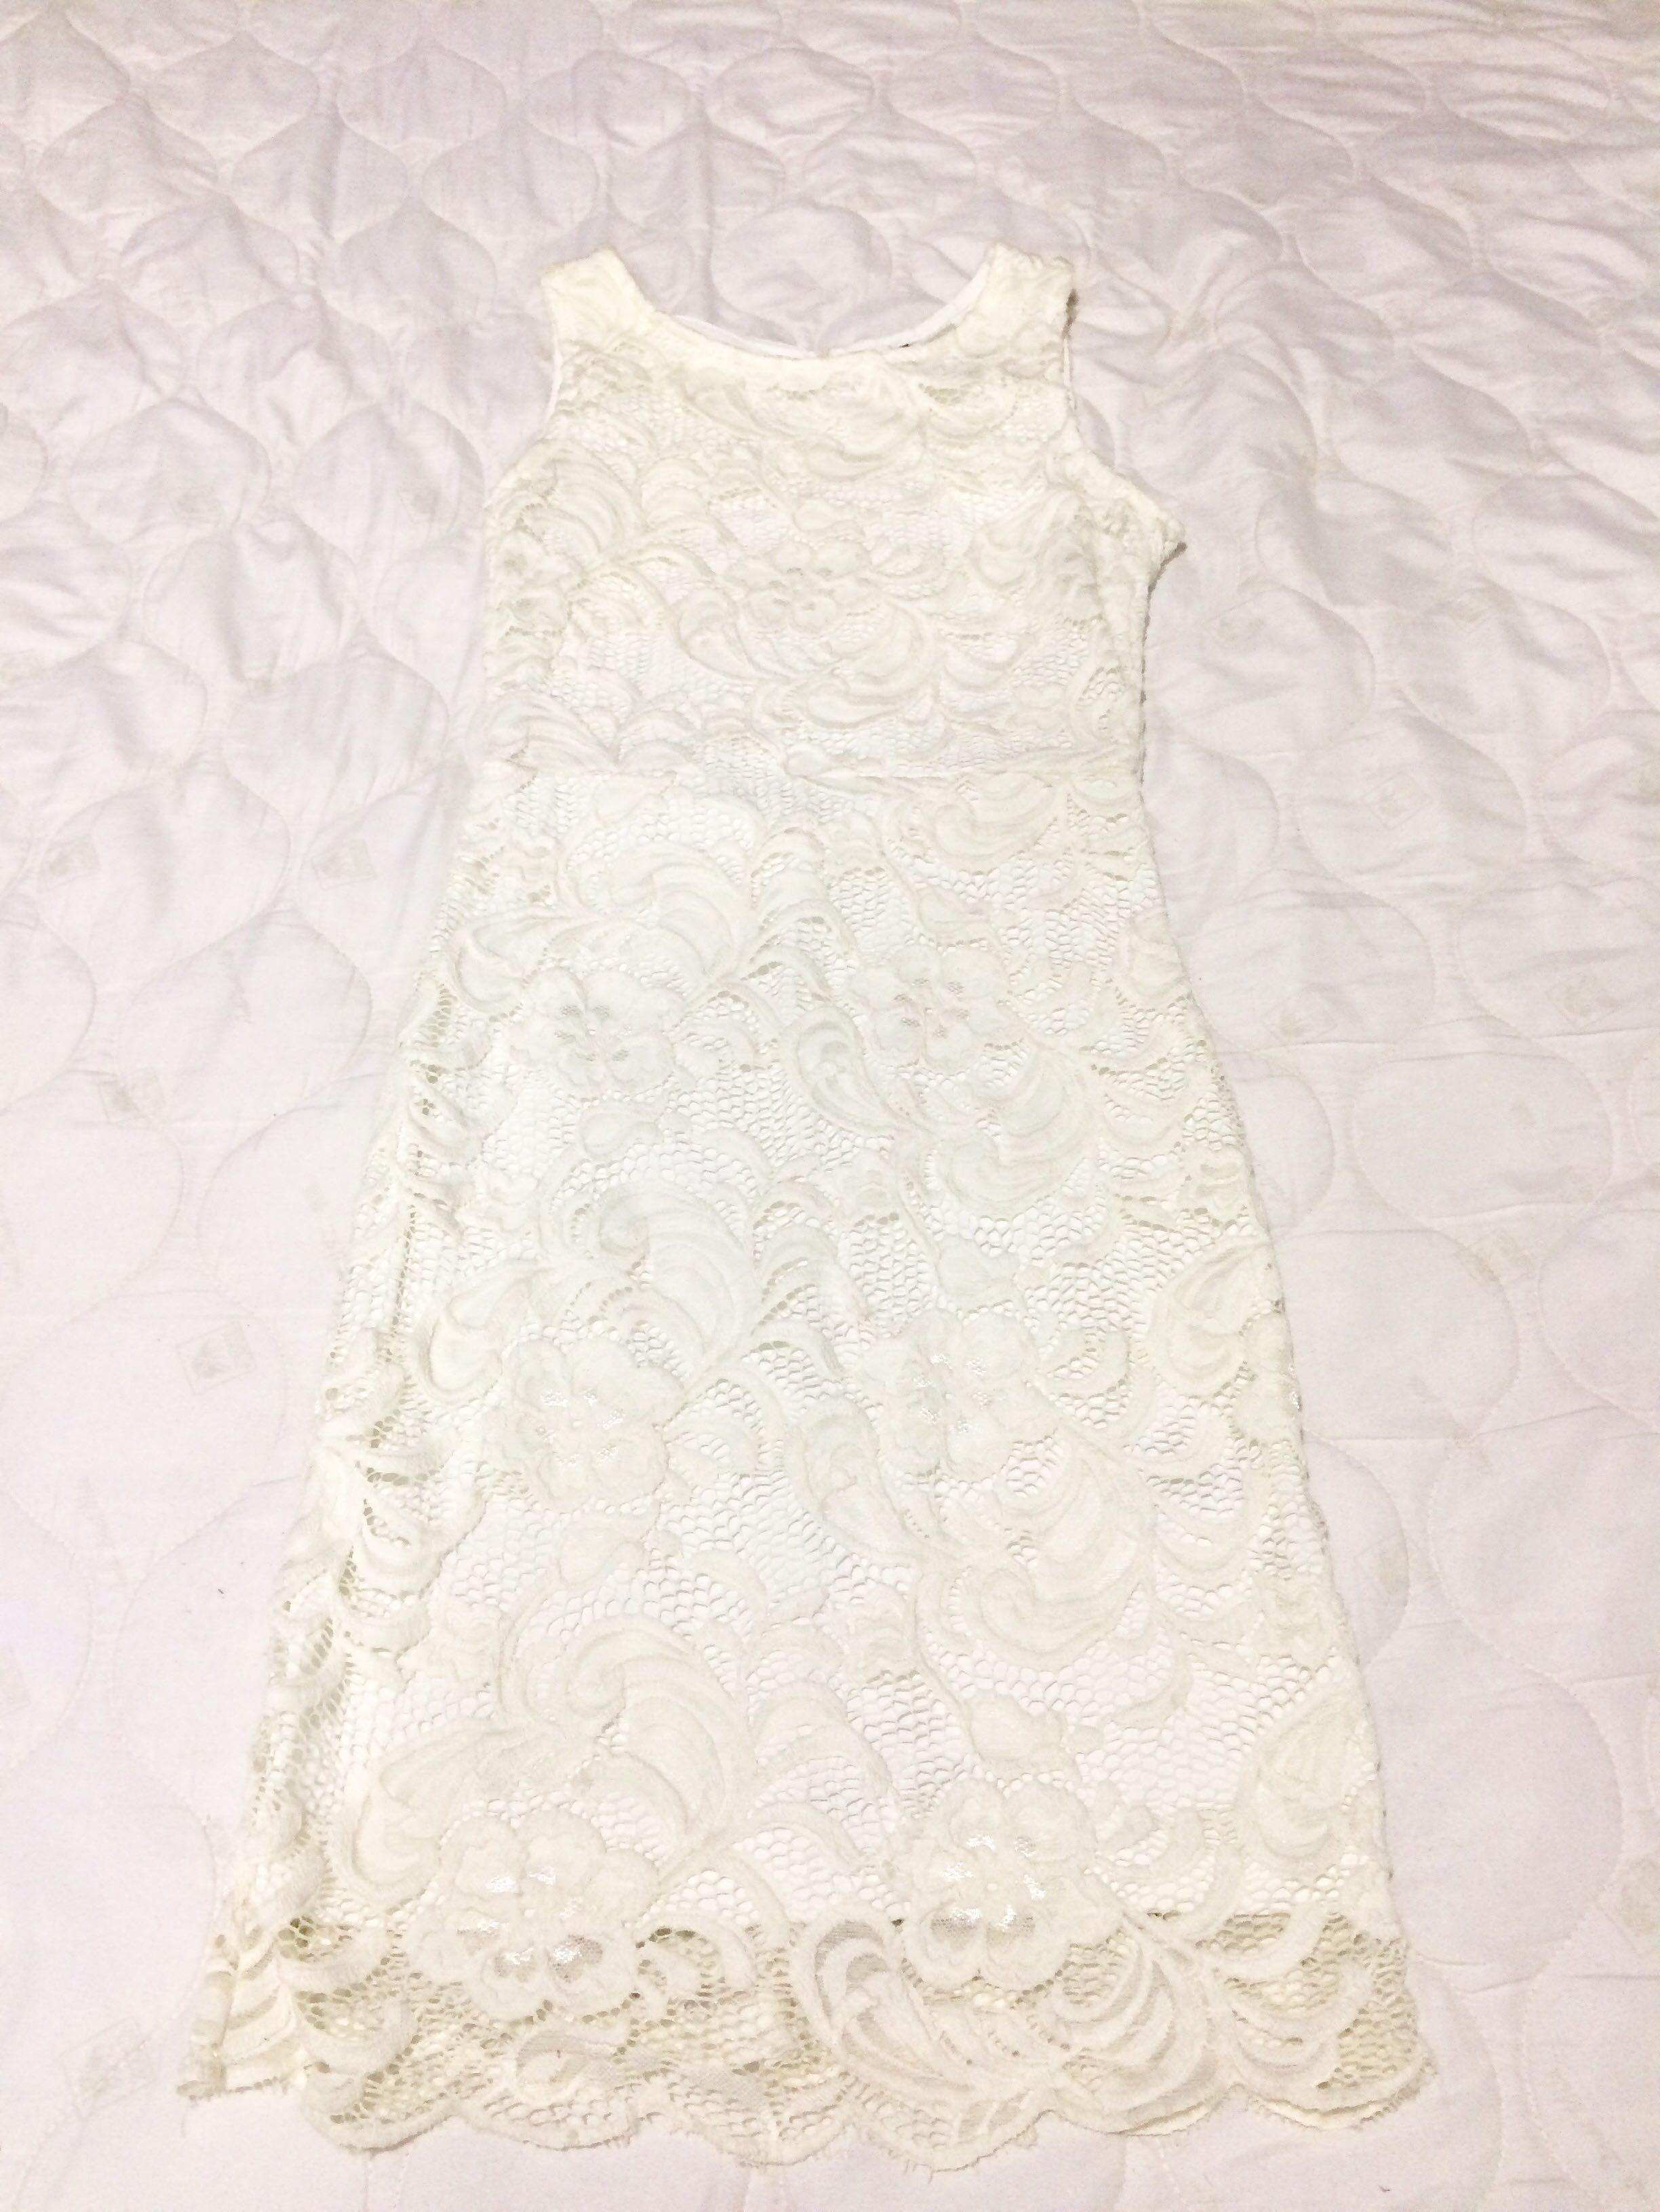 H&M Lace Bare back Dress